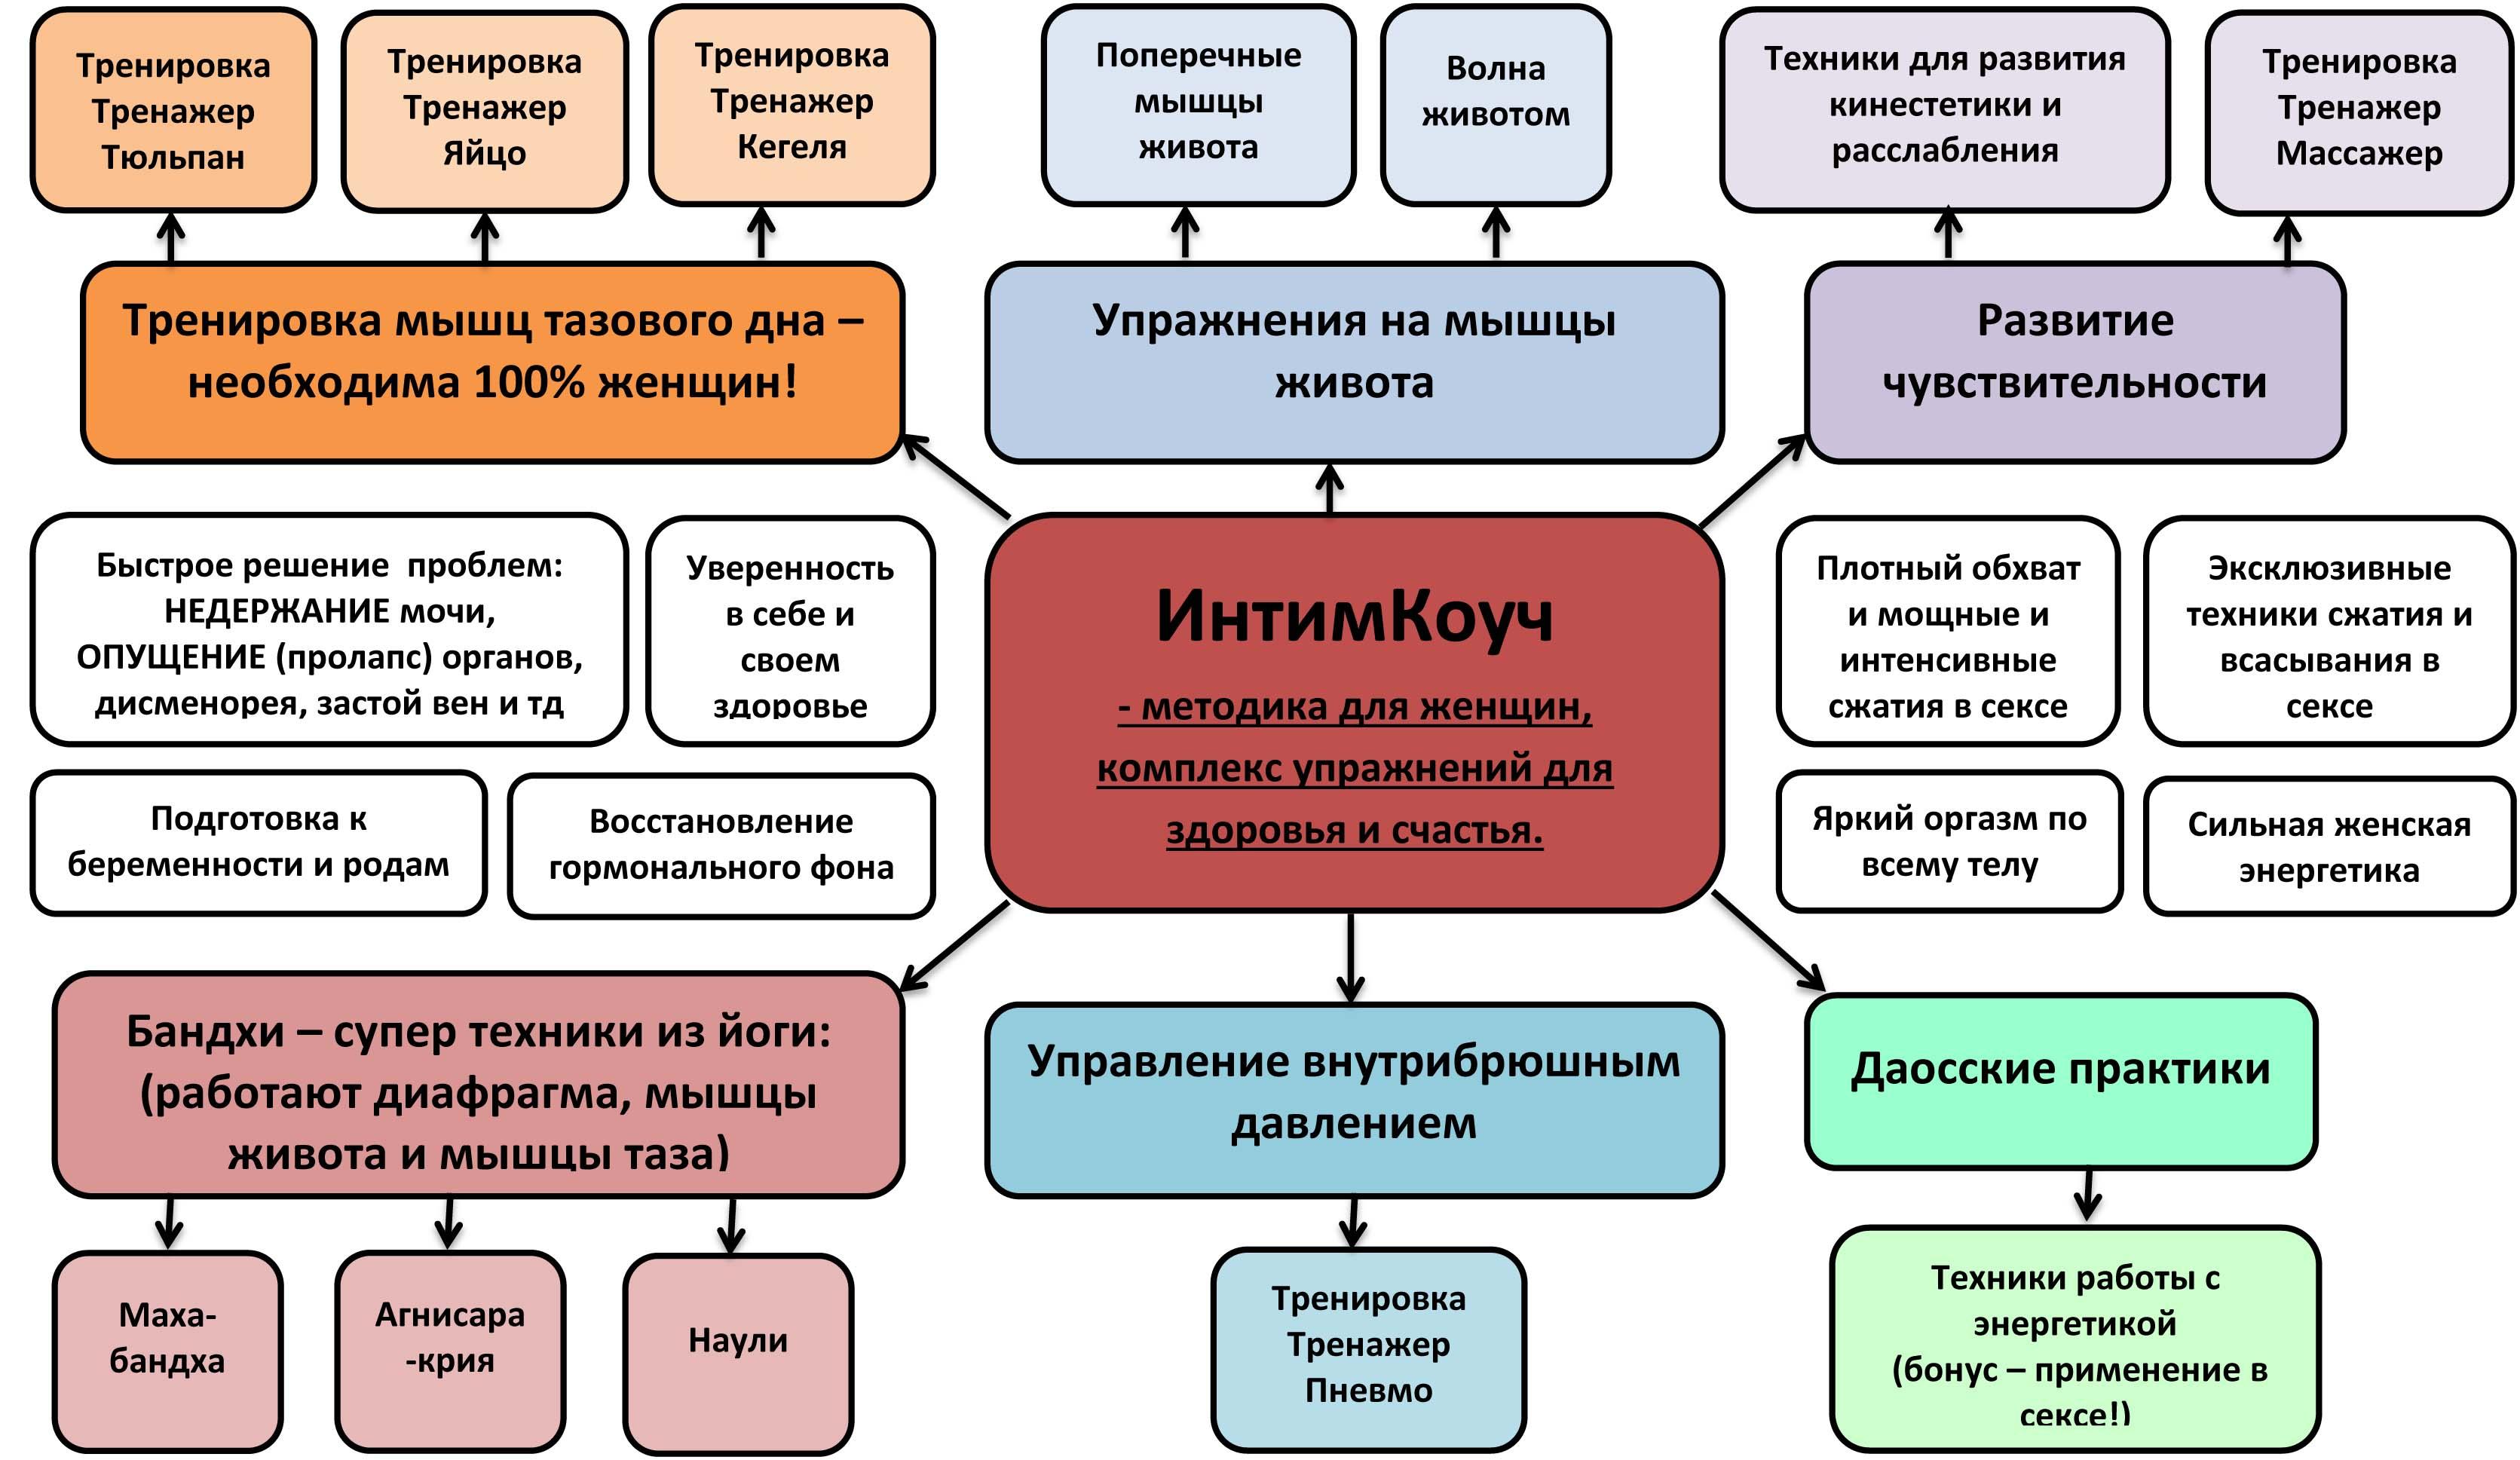 Блок схема Методика ИнтимКоуч